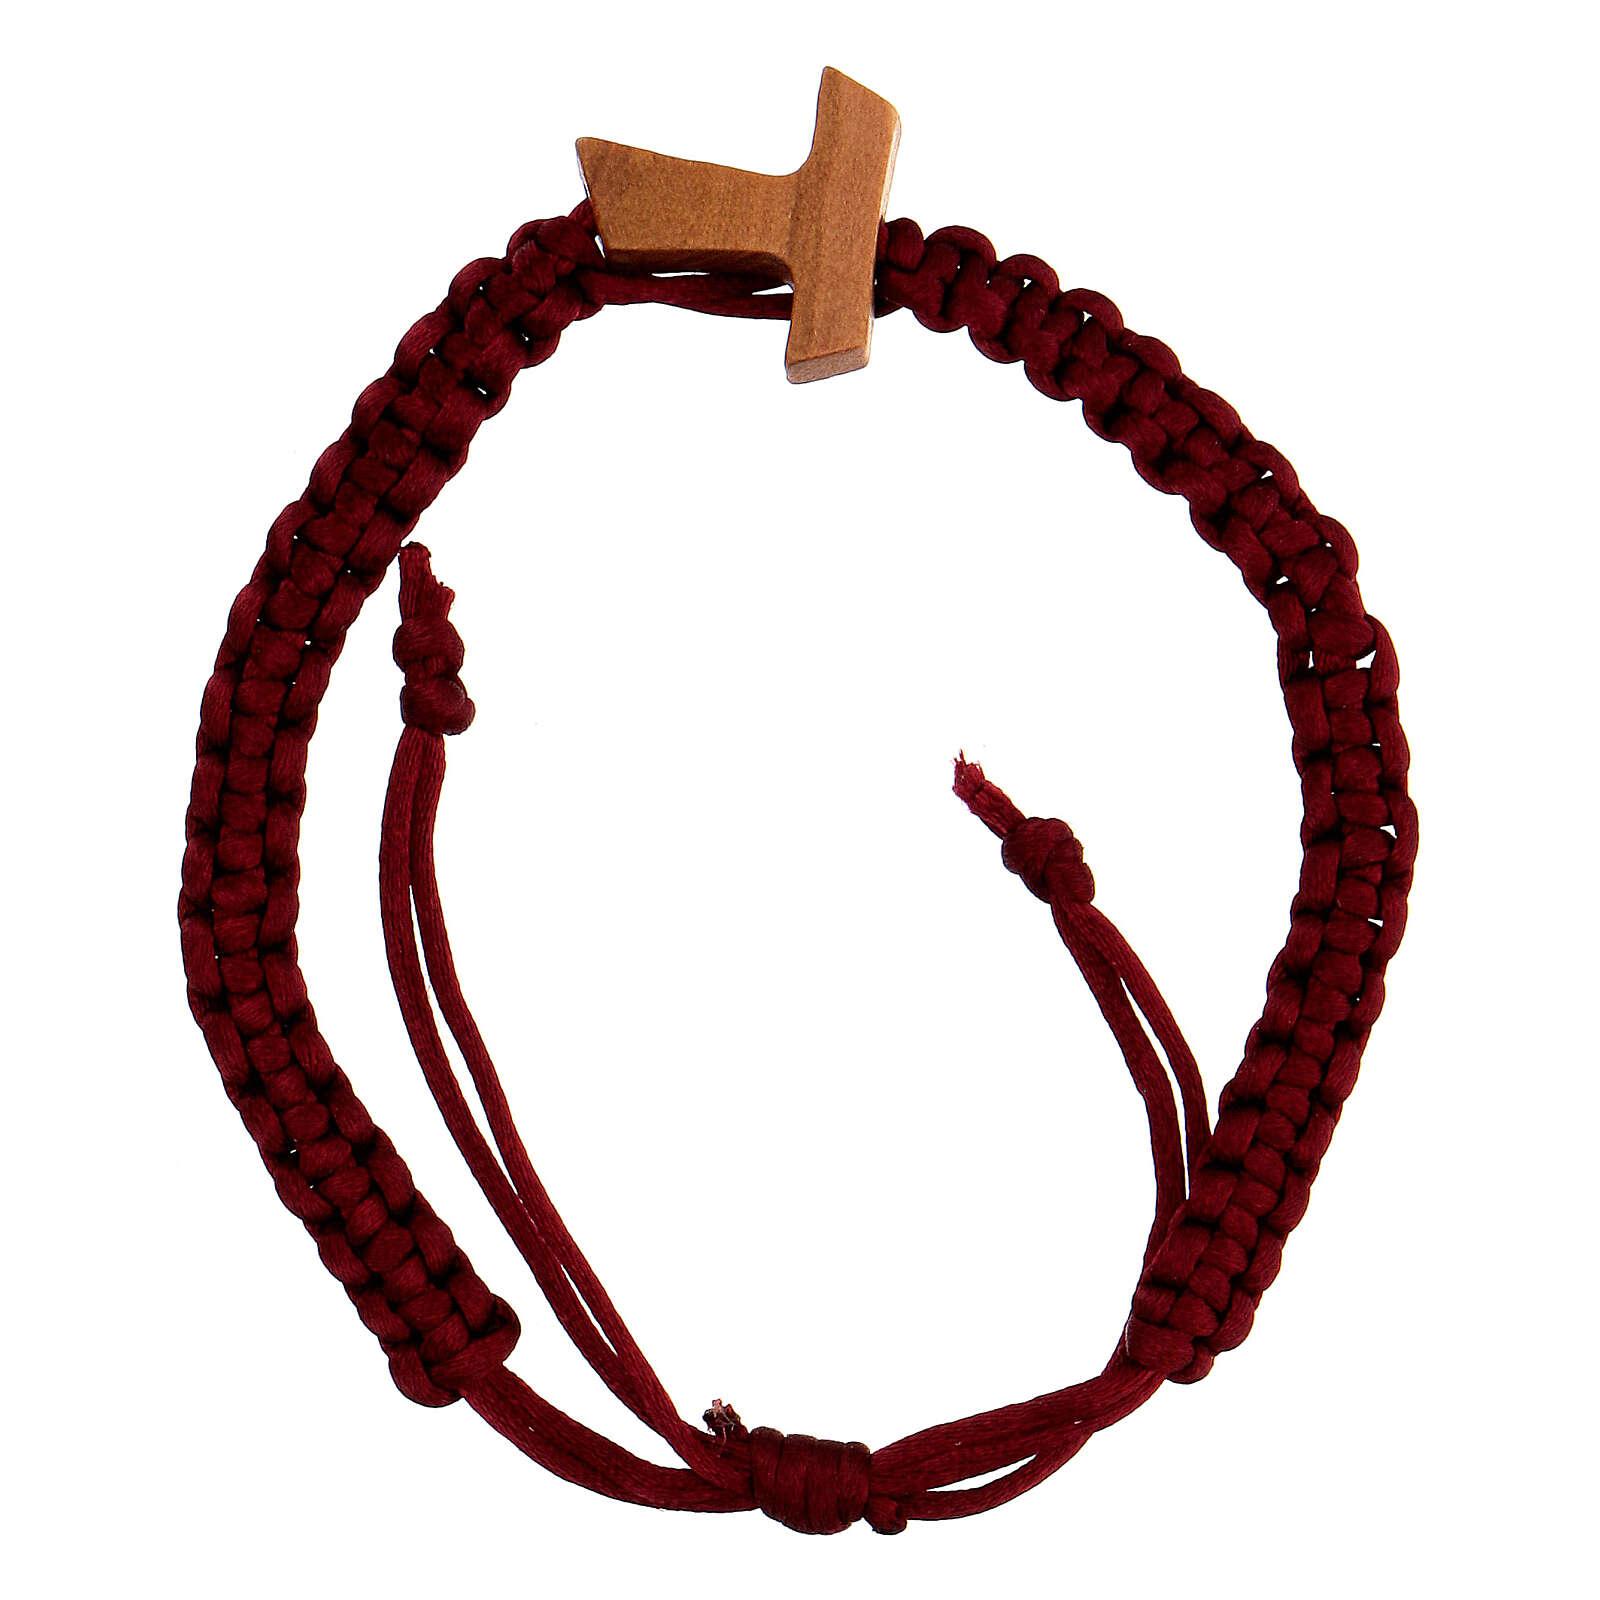 Bracciale decina in corda rossa regolabile con croce tau  4